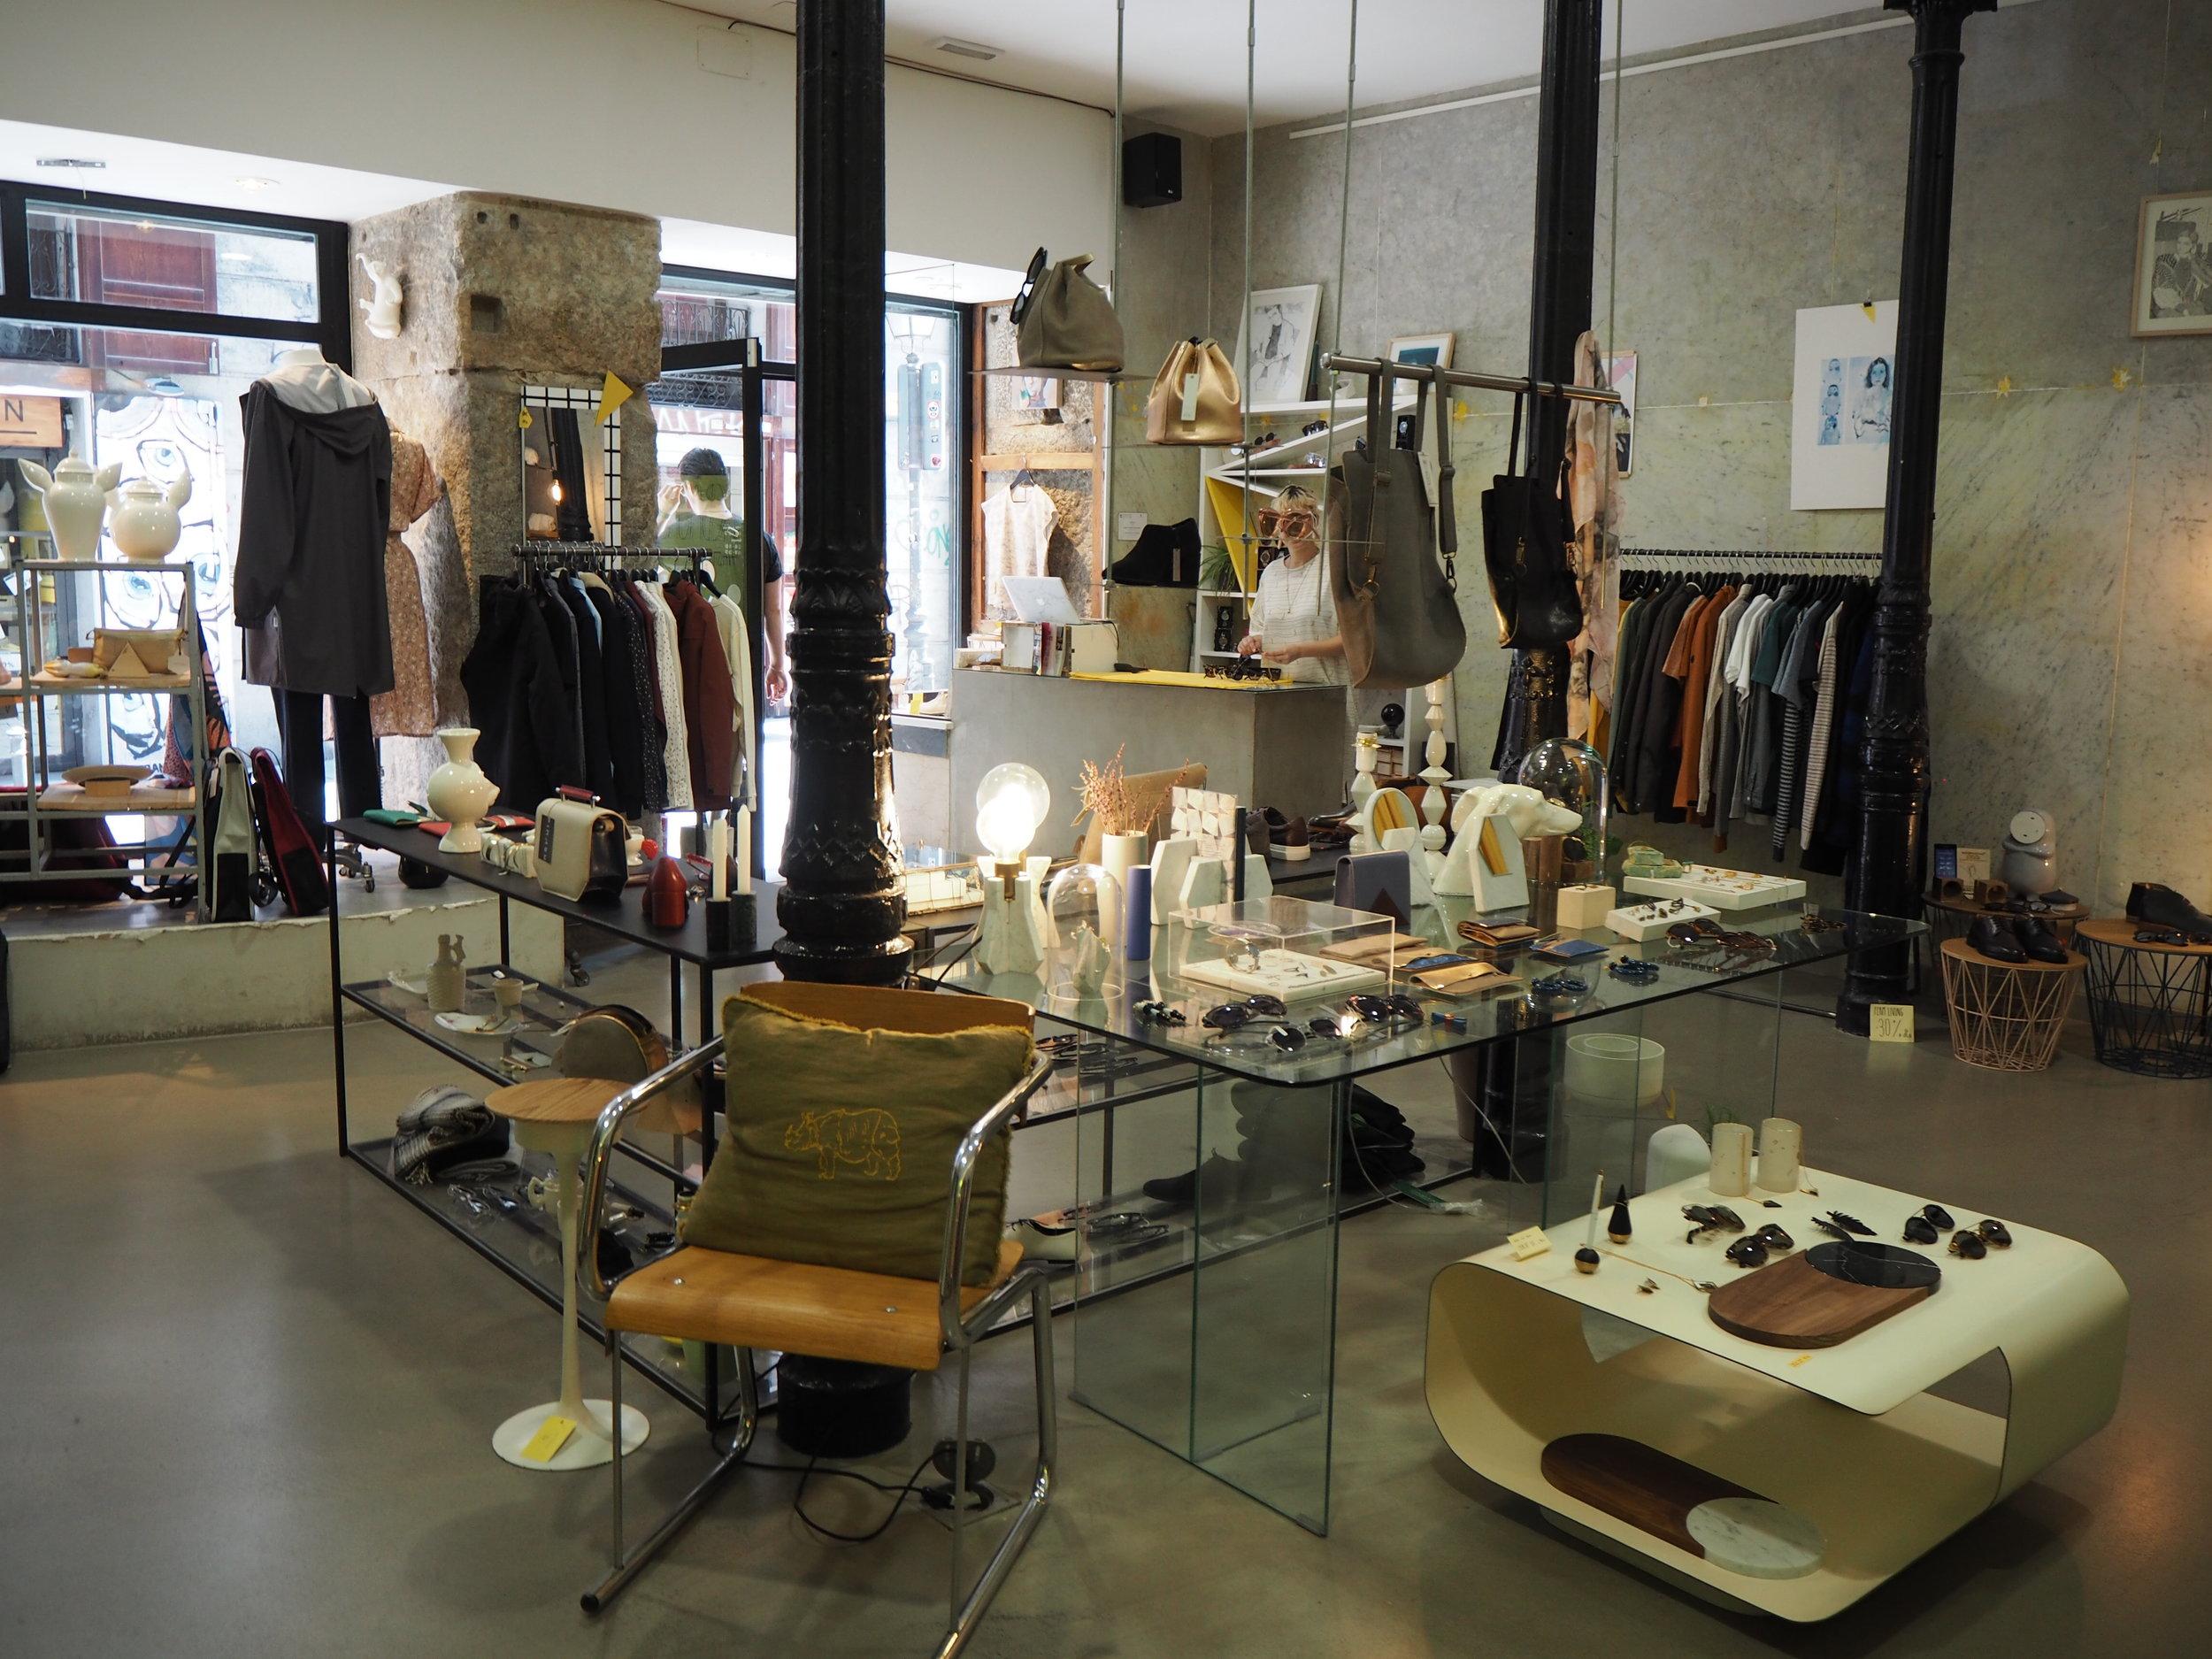 tiendas-ropa-madrid-originles-rughara-interior.JPG